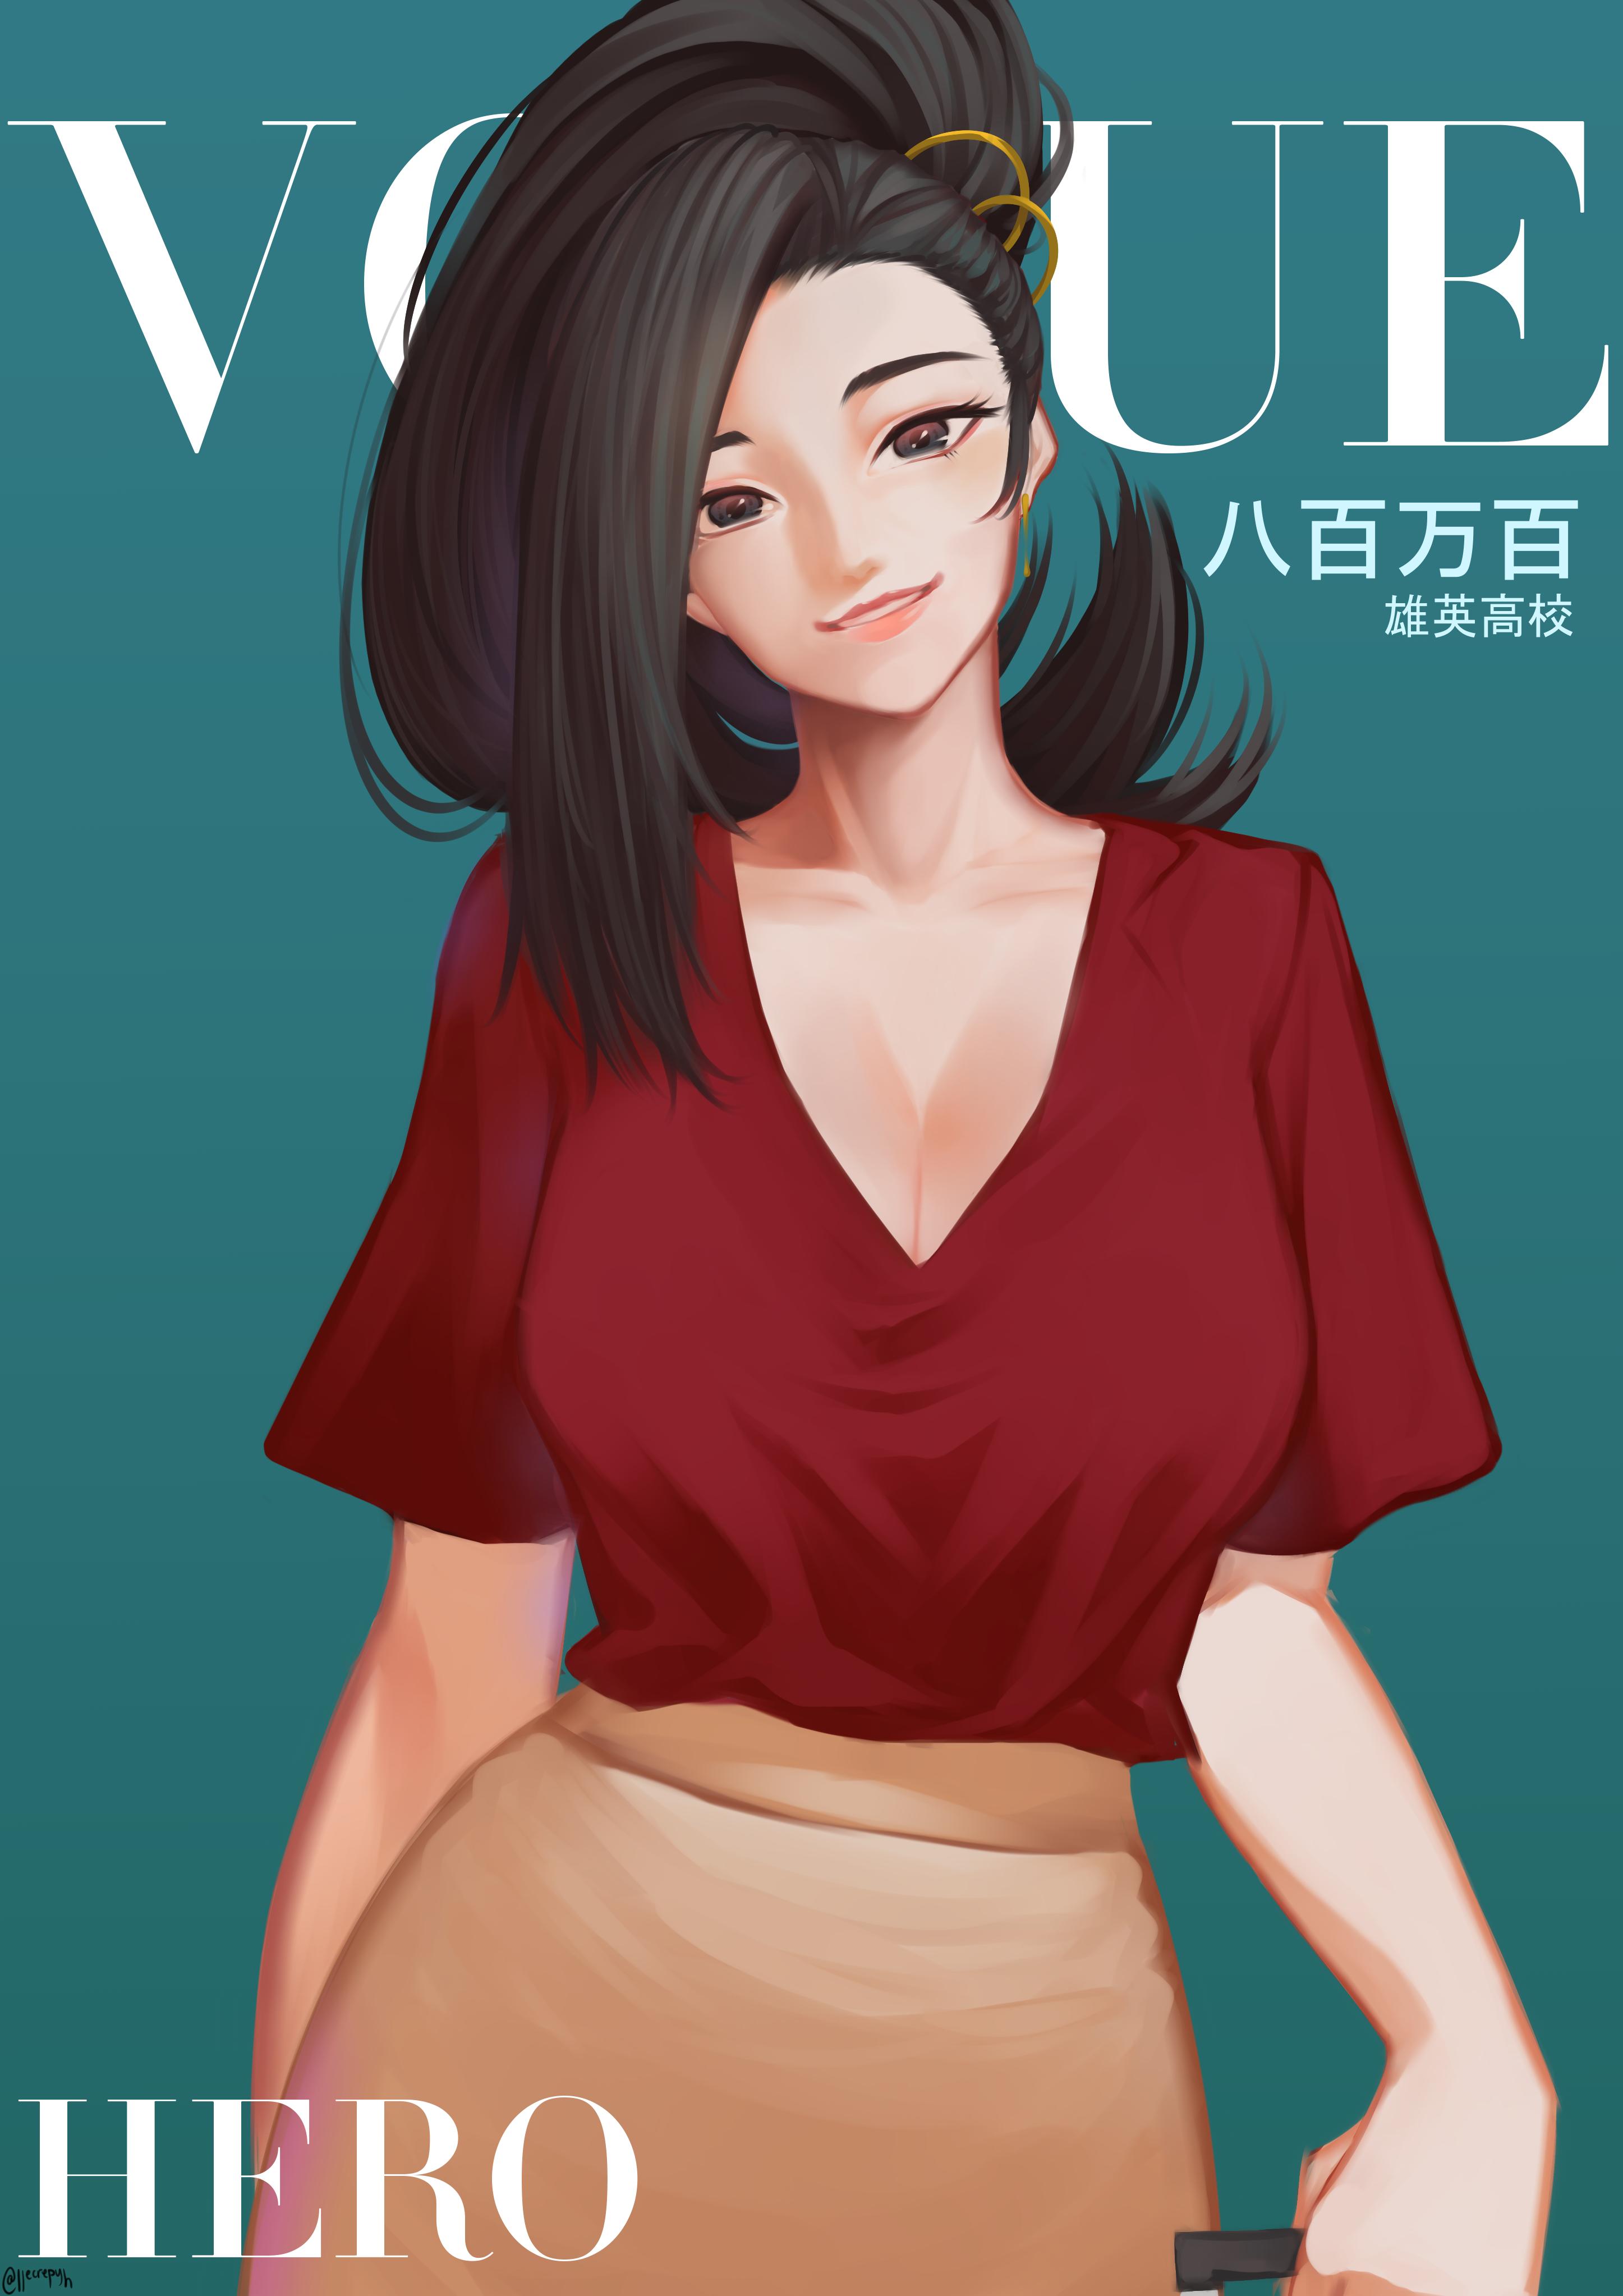 Anime 2893x4092 Boku no Hero Academia anime girls Yaoyorozu Momo portrait black hair red t-shirt smiling ponytail black eyes long hair big boobs magazine cover 2D fan art frontal view